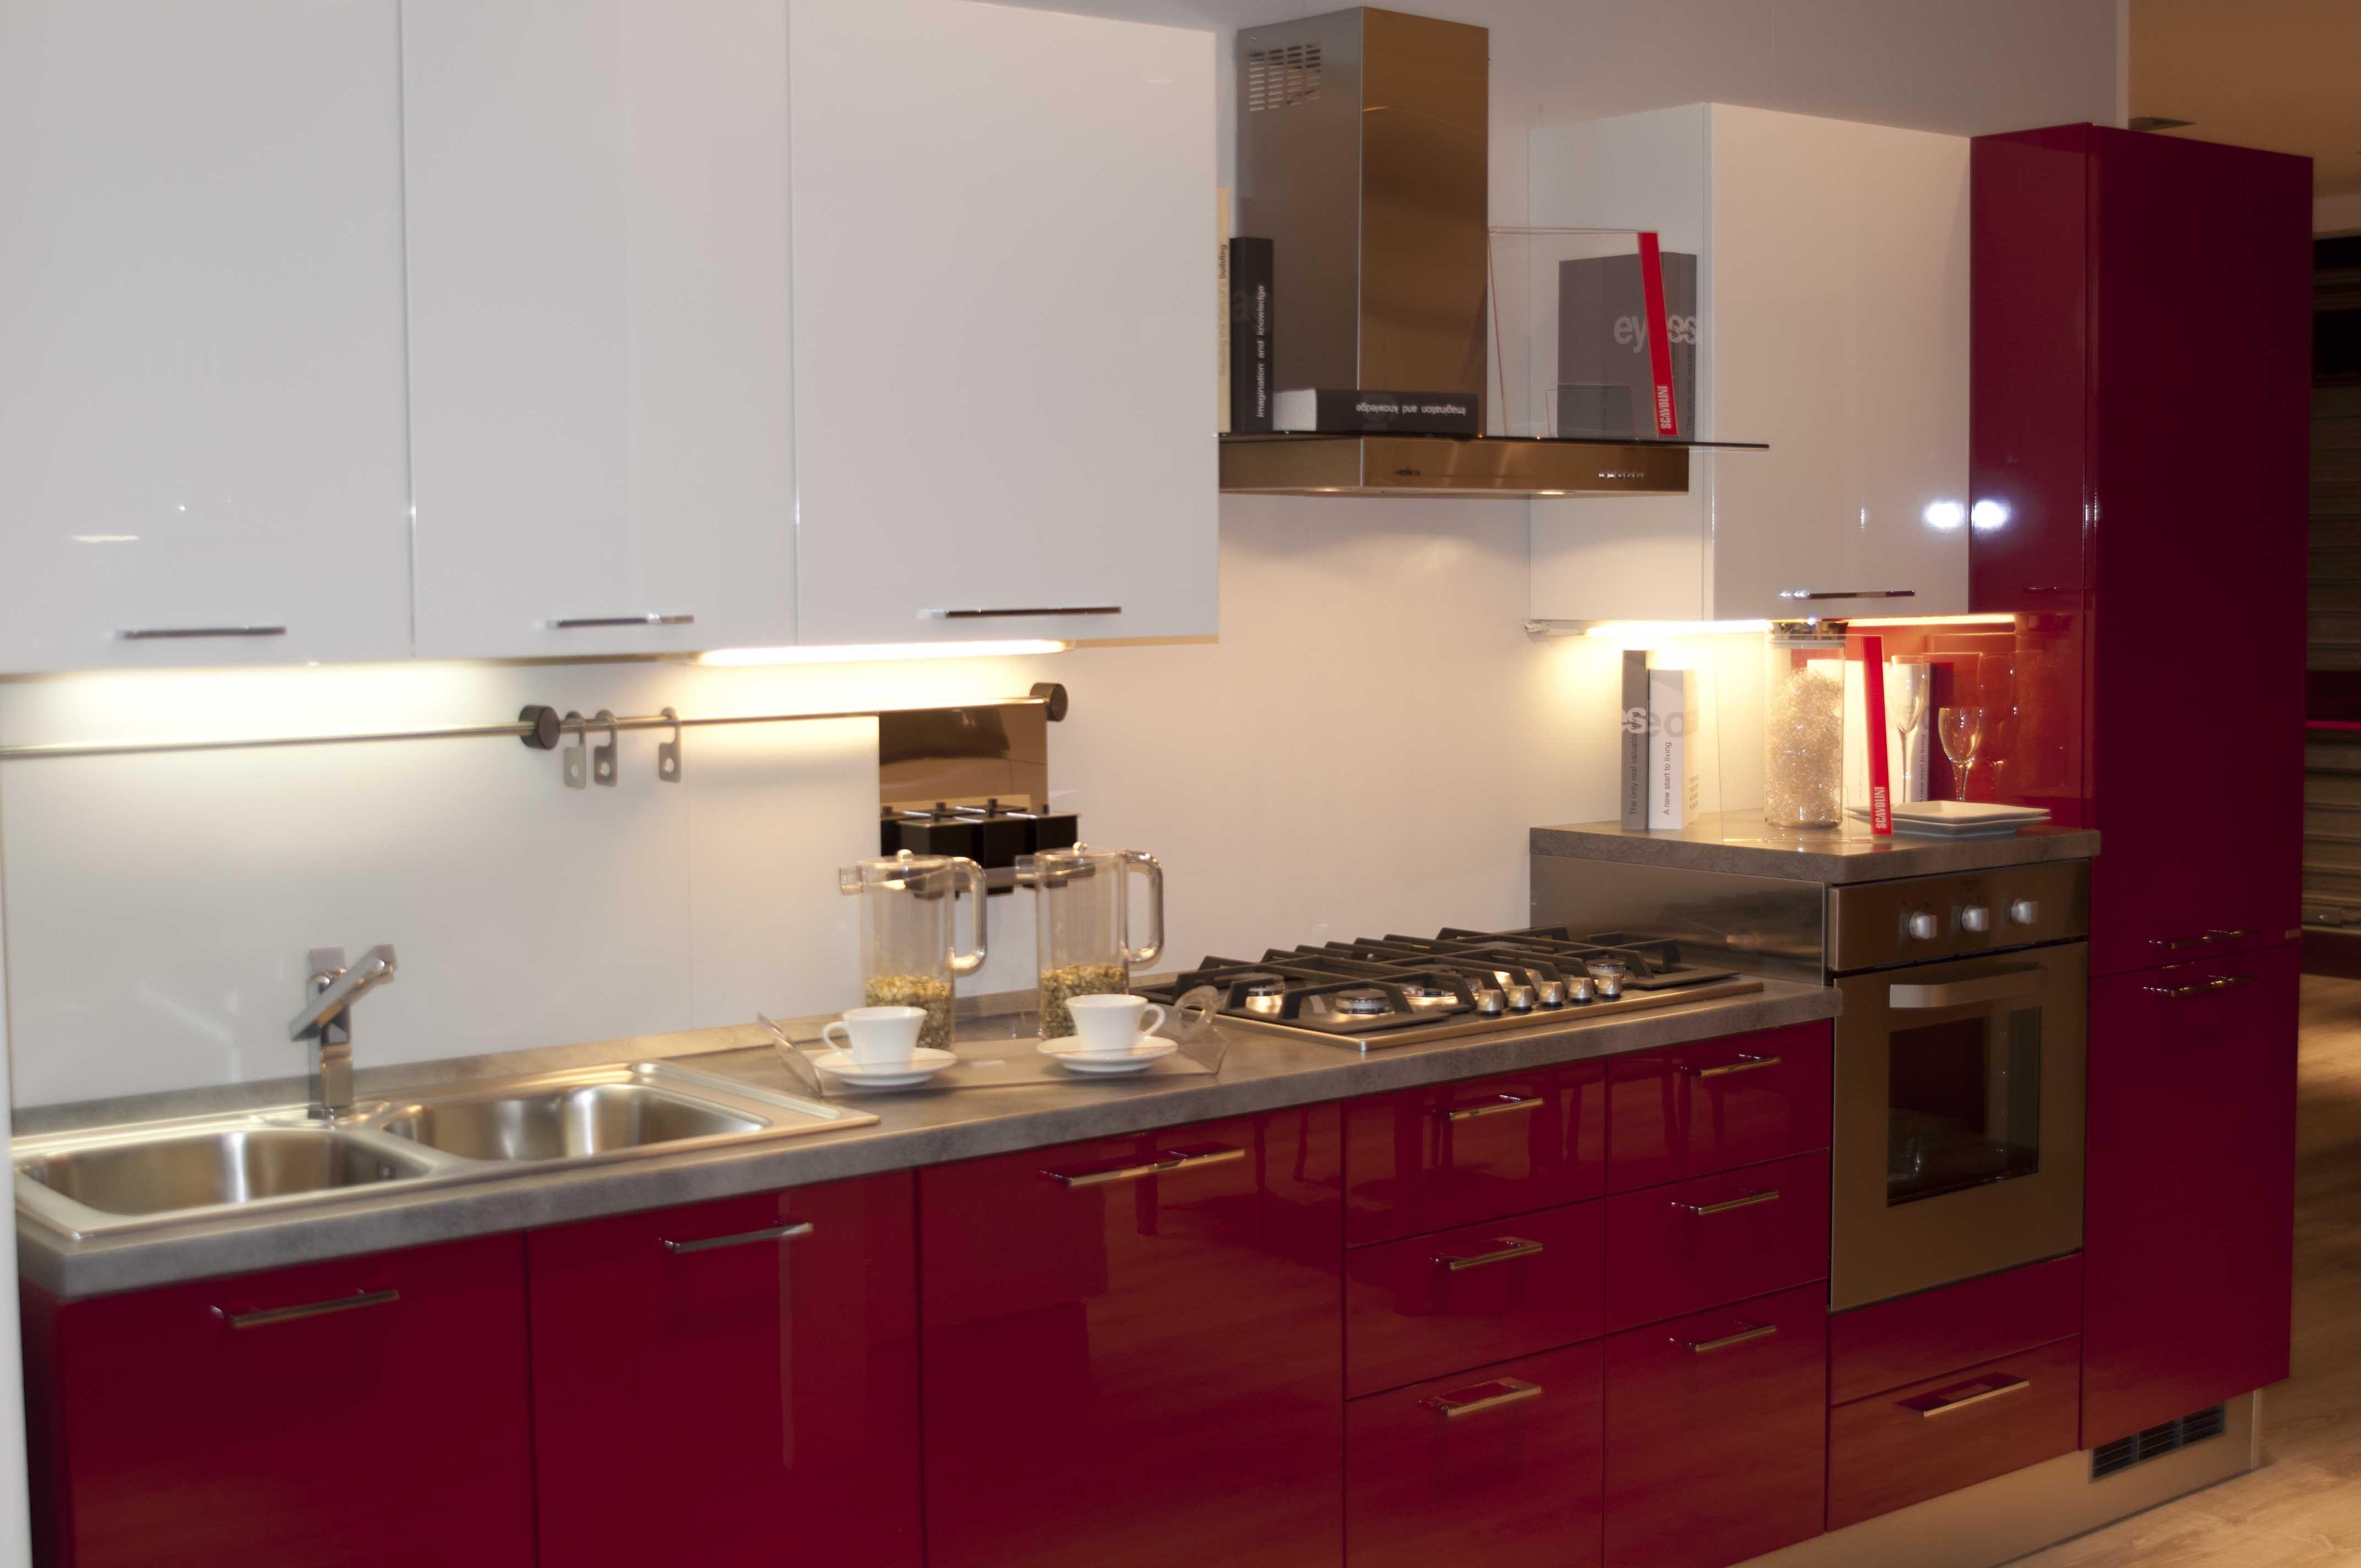 Cucina bianca e rossa Scavolini | Foggia | Home sweet home | Cucine ...